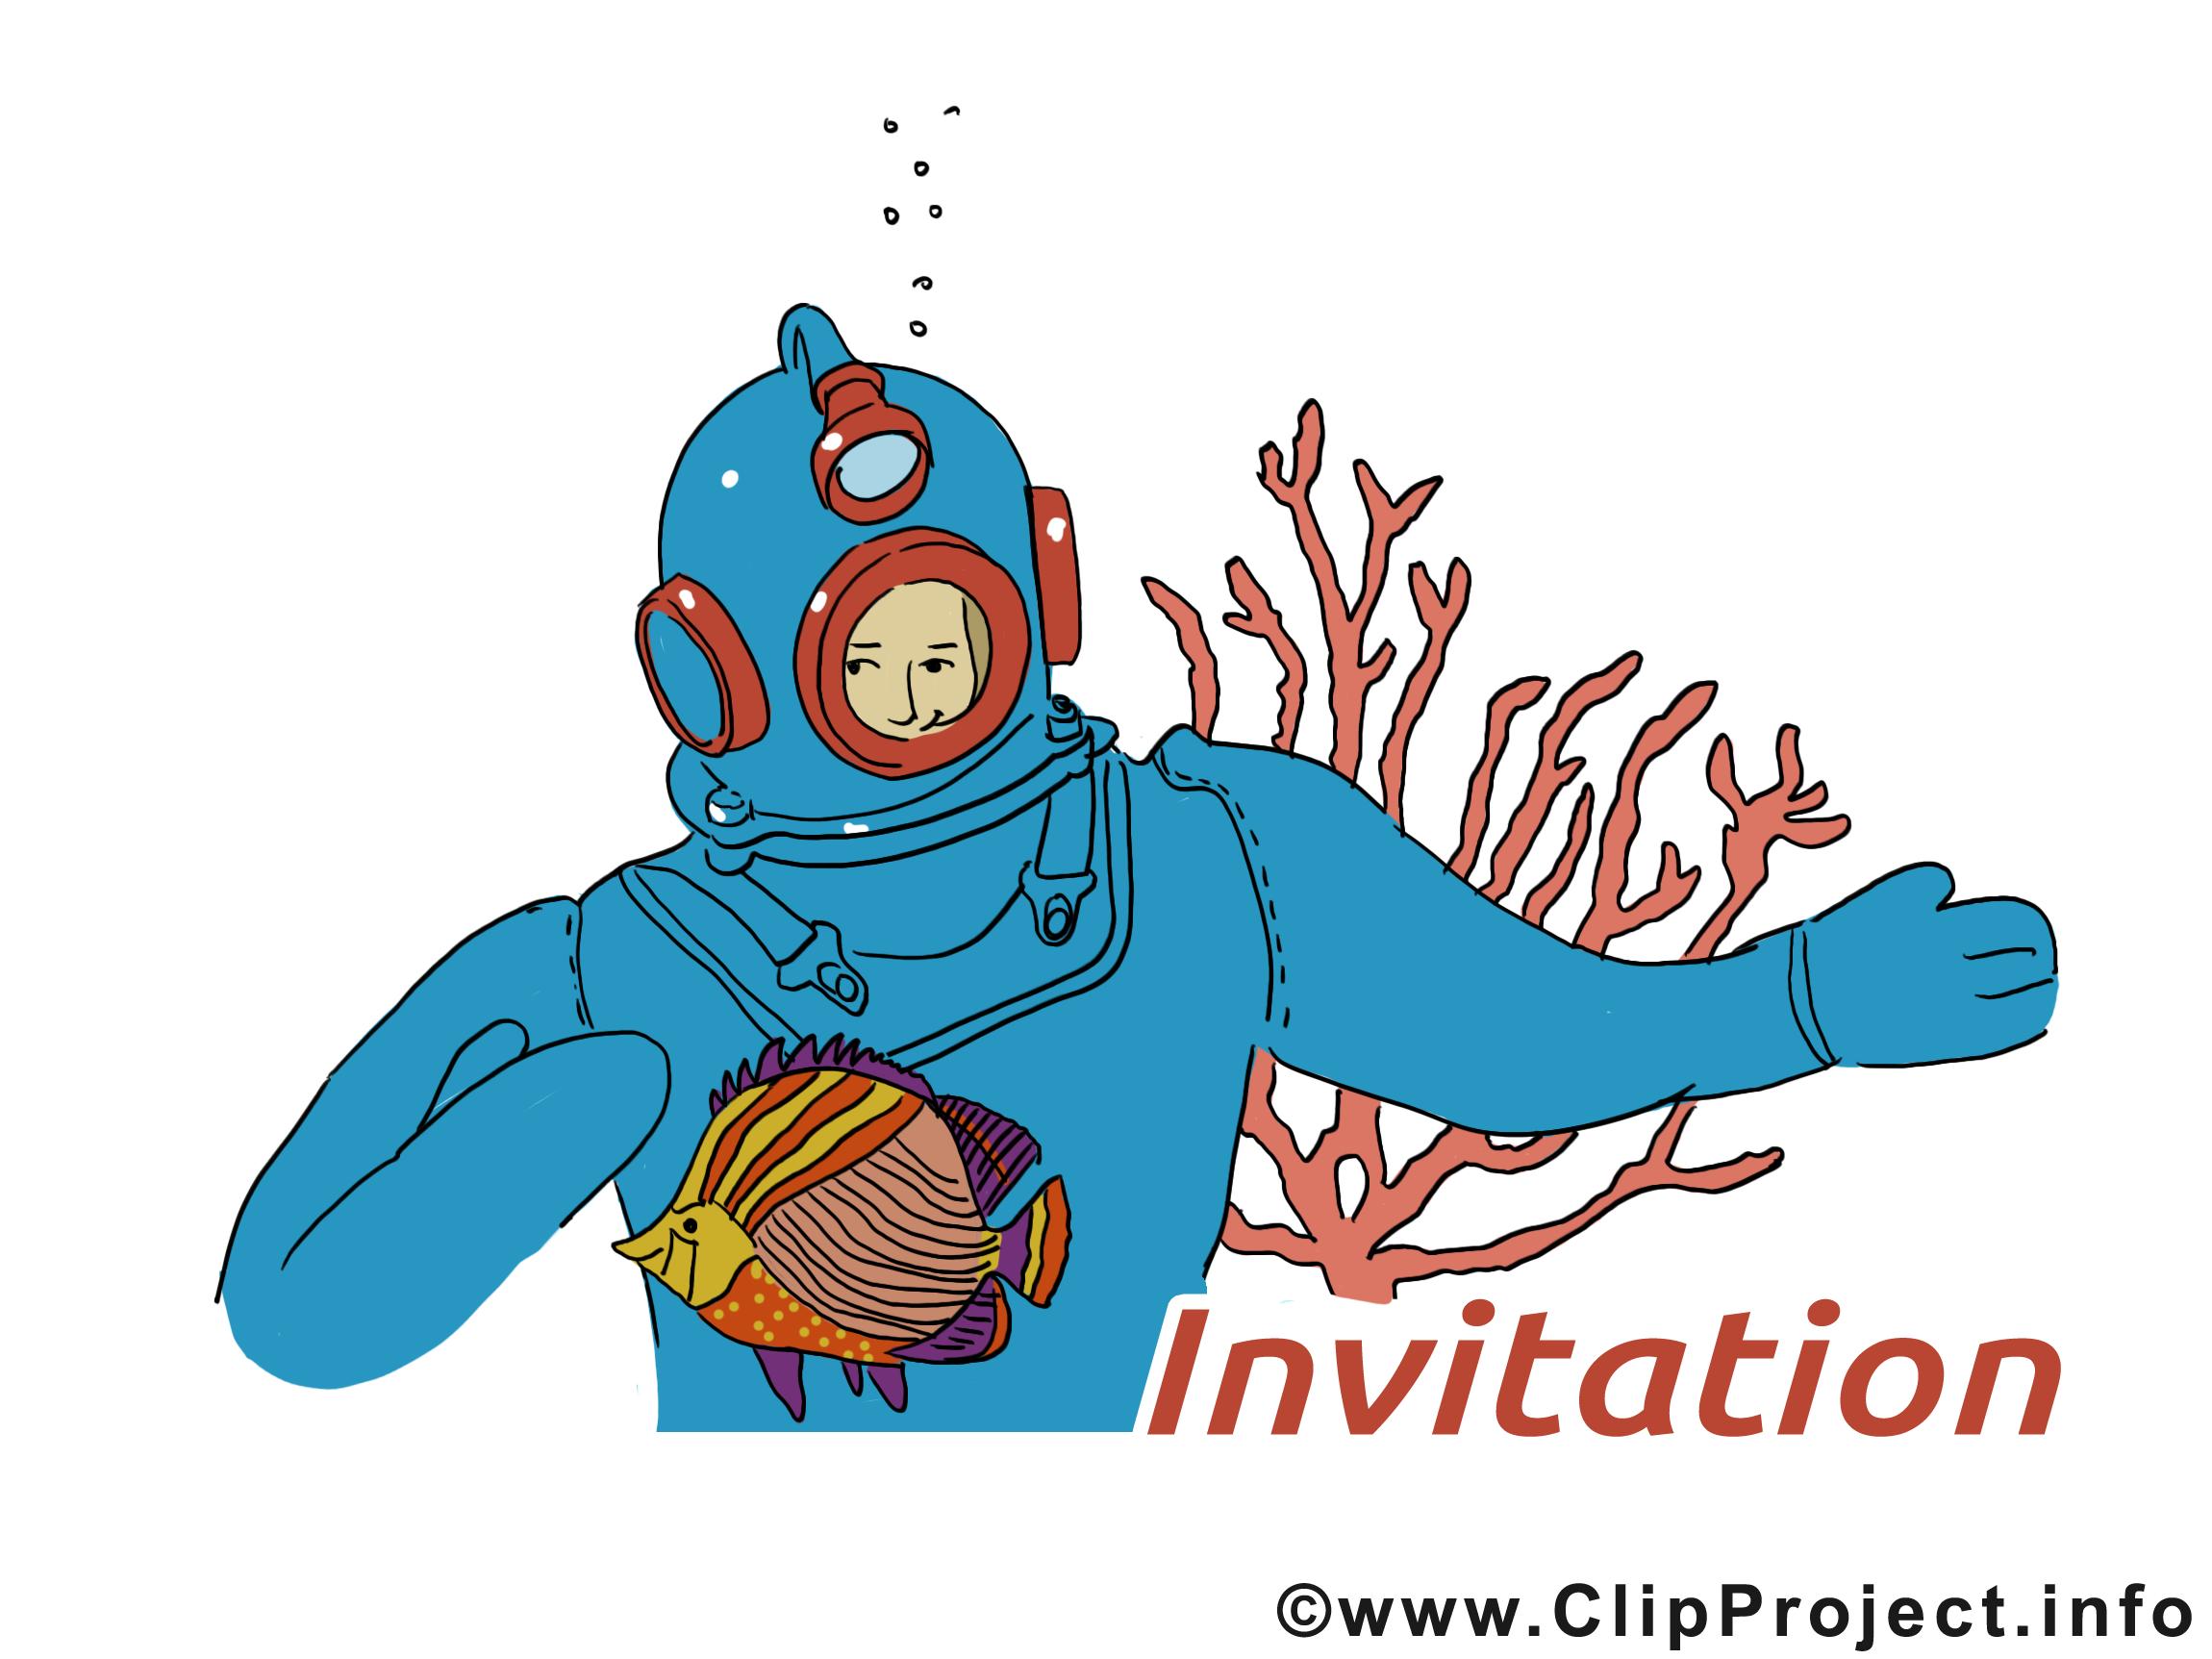 Sous-marinier illustration - Invitation clipart